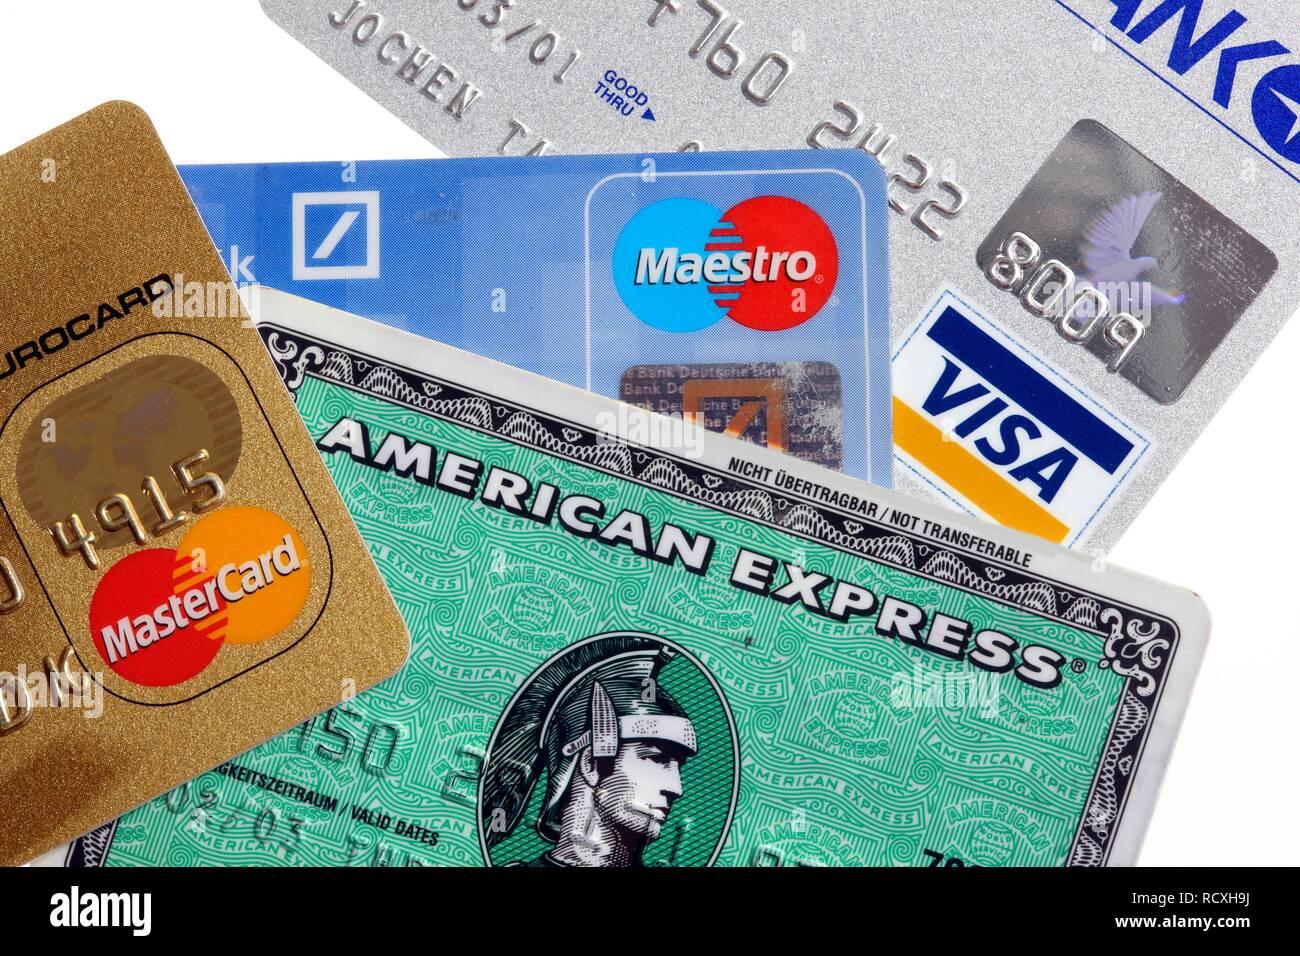 Maestro Ec Karte.Verschiedenen Kreditkarten Mastercard American Express Visa